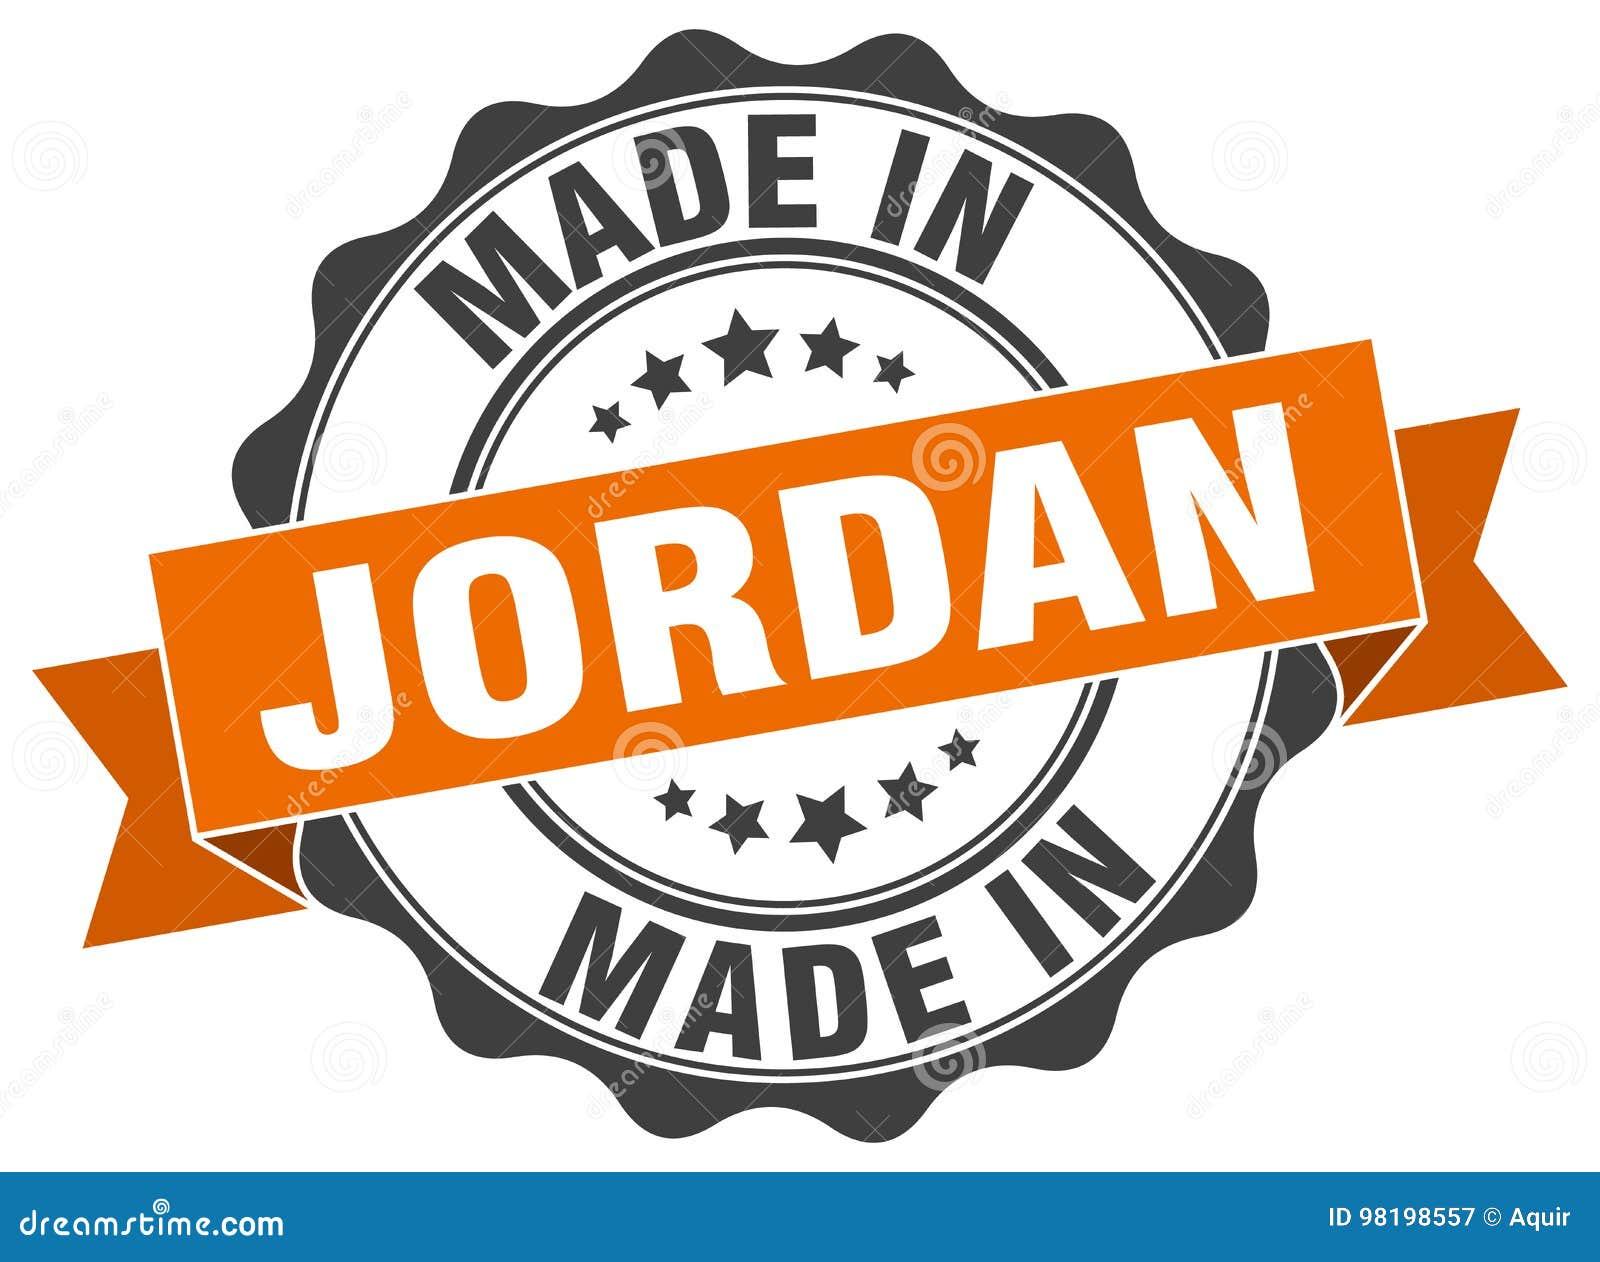 Made In Jordan Seal Stock Vector Illustration Of Fabricated 98198557